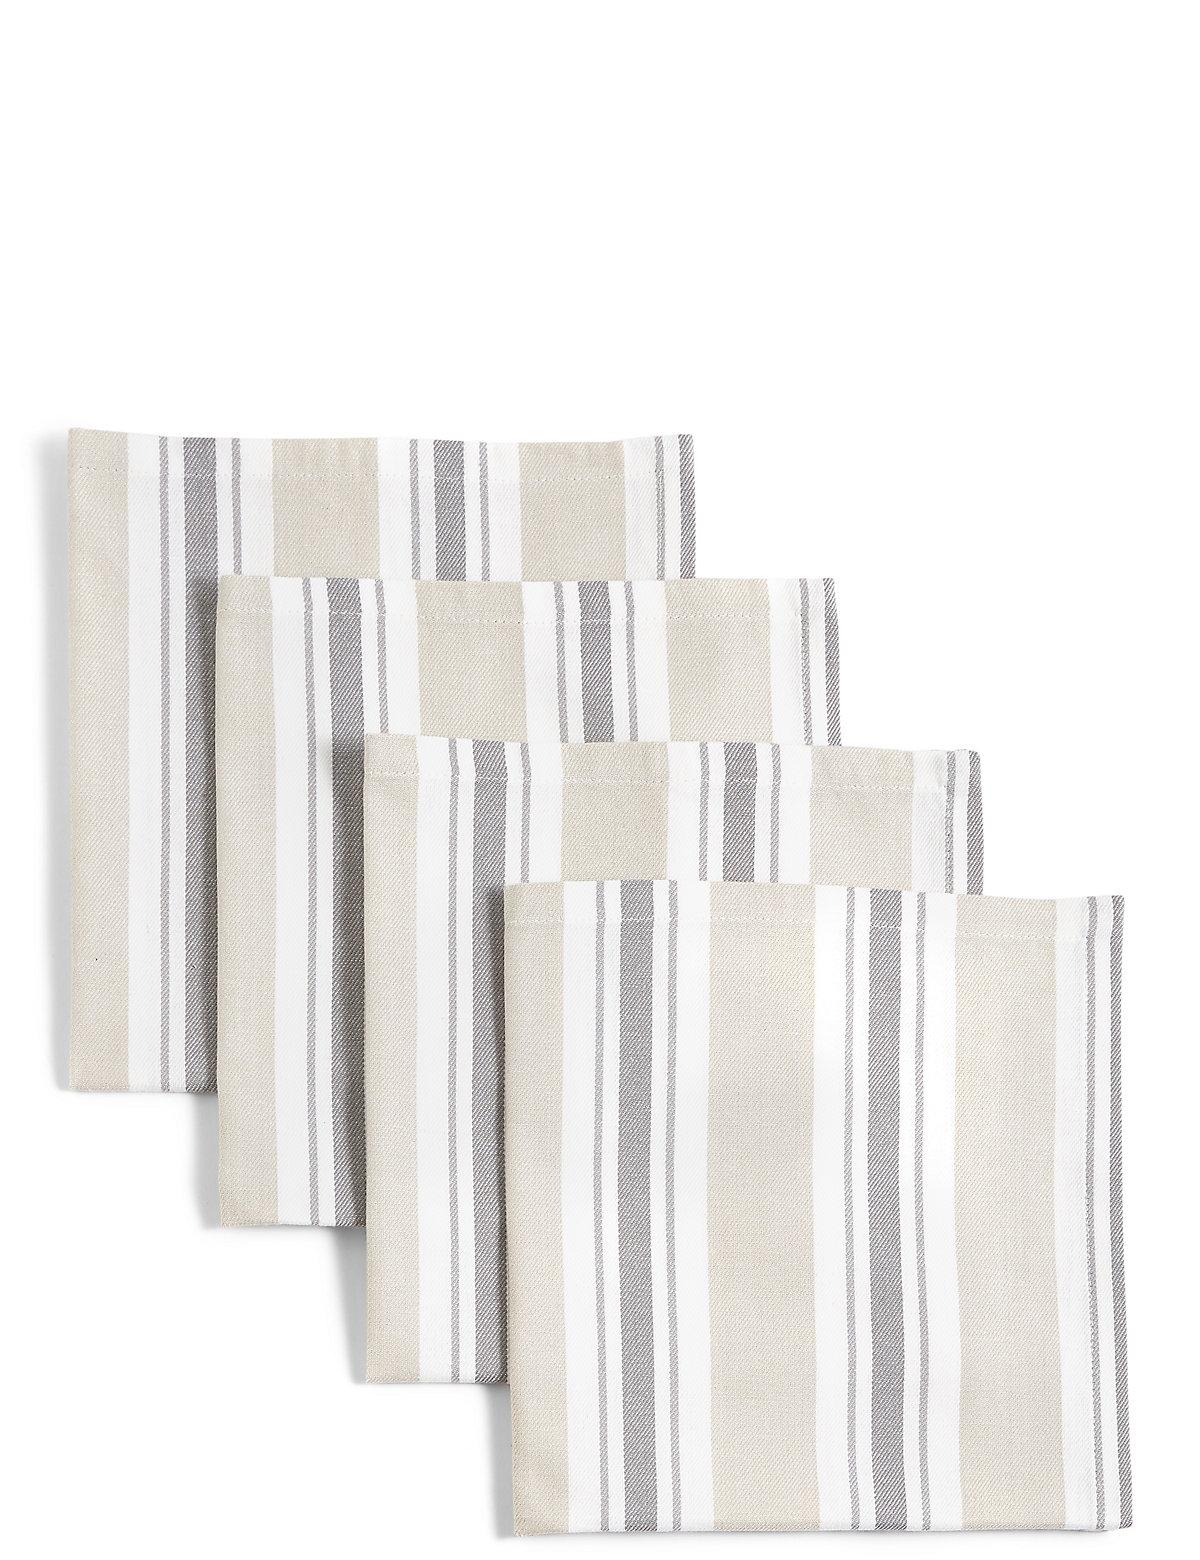 4 Pack Twill Stripe Napkins